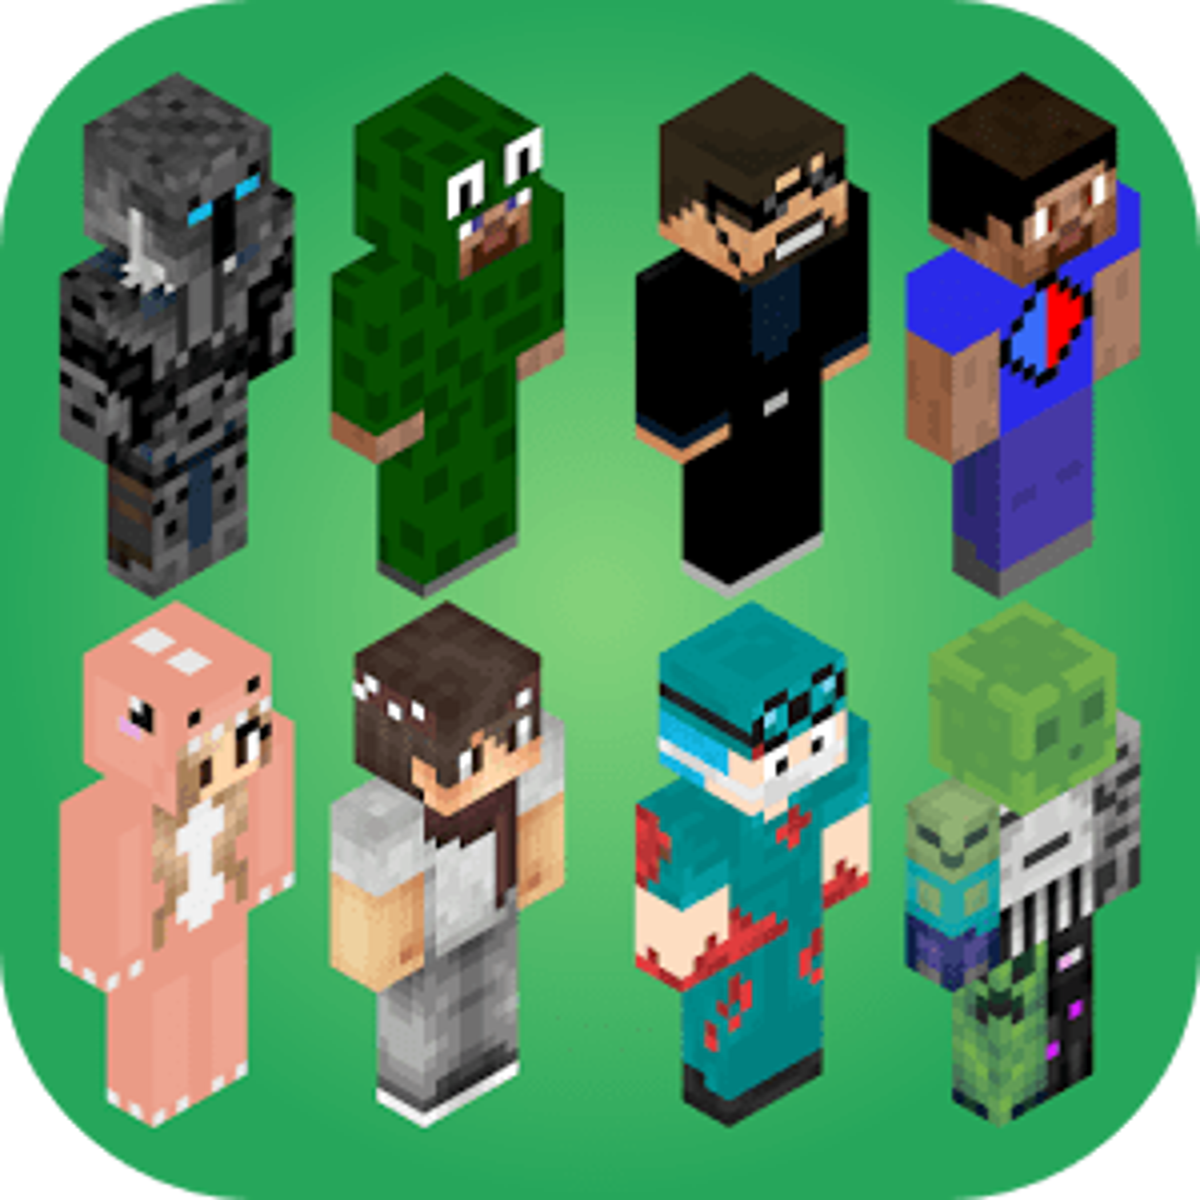 Skins for Minecraft 2 1.3